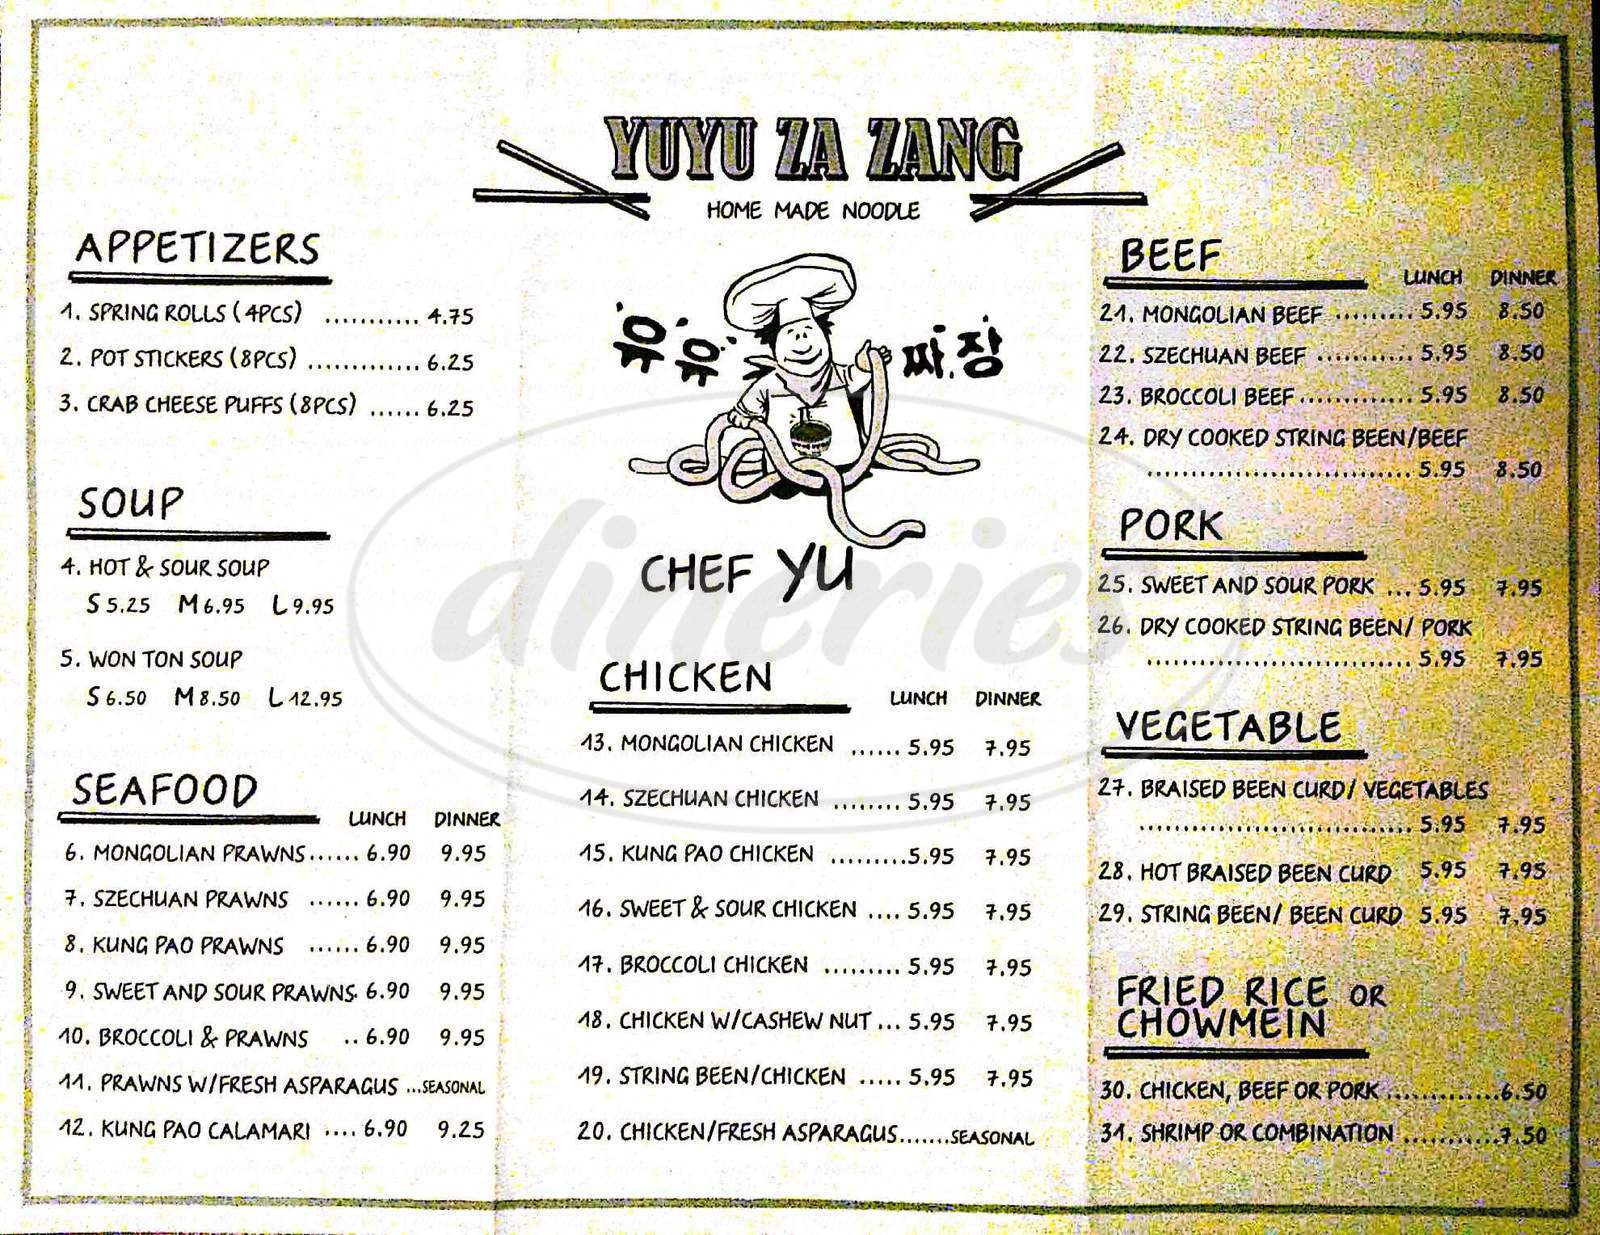 Big menu for Yuyu Za Zang, Oakland